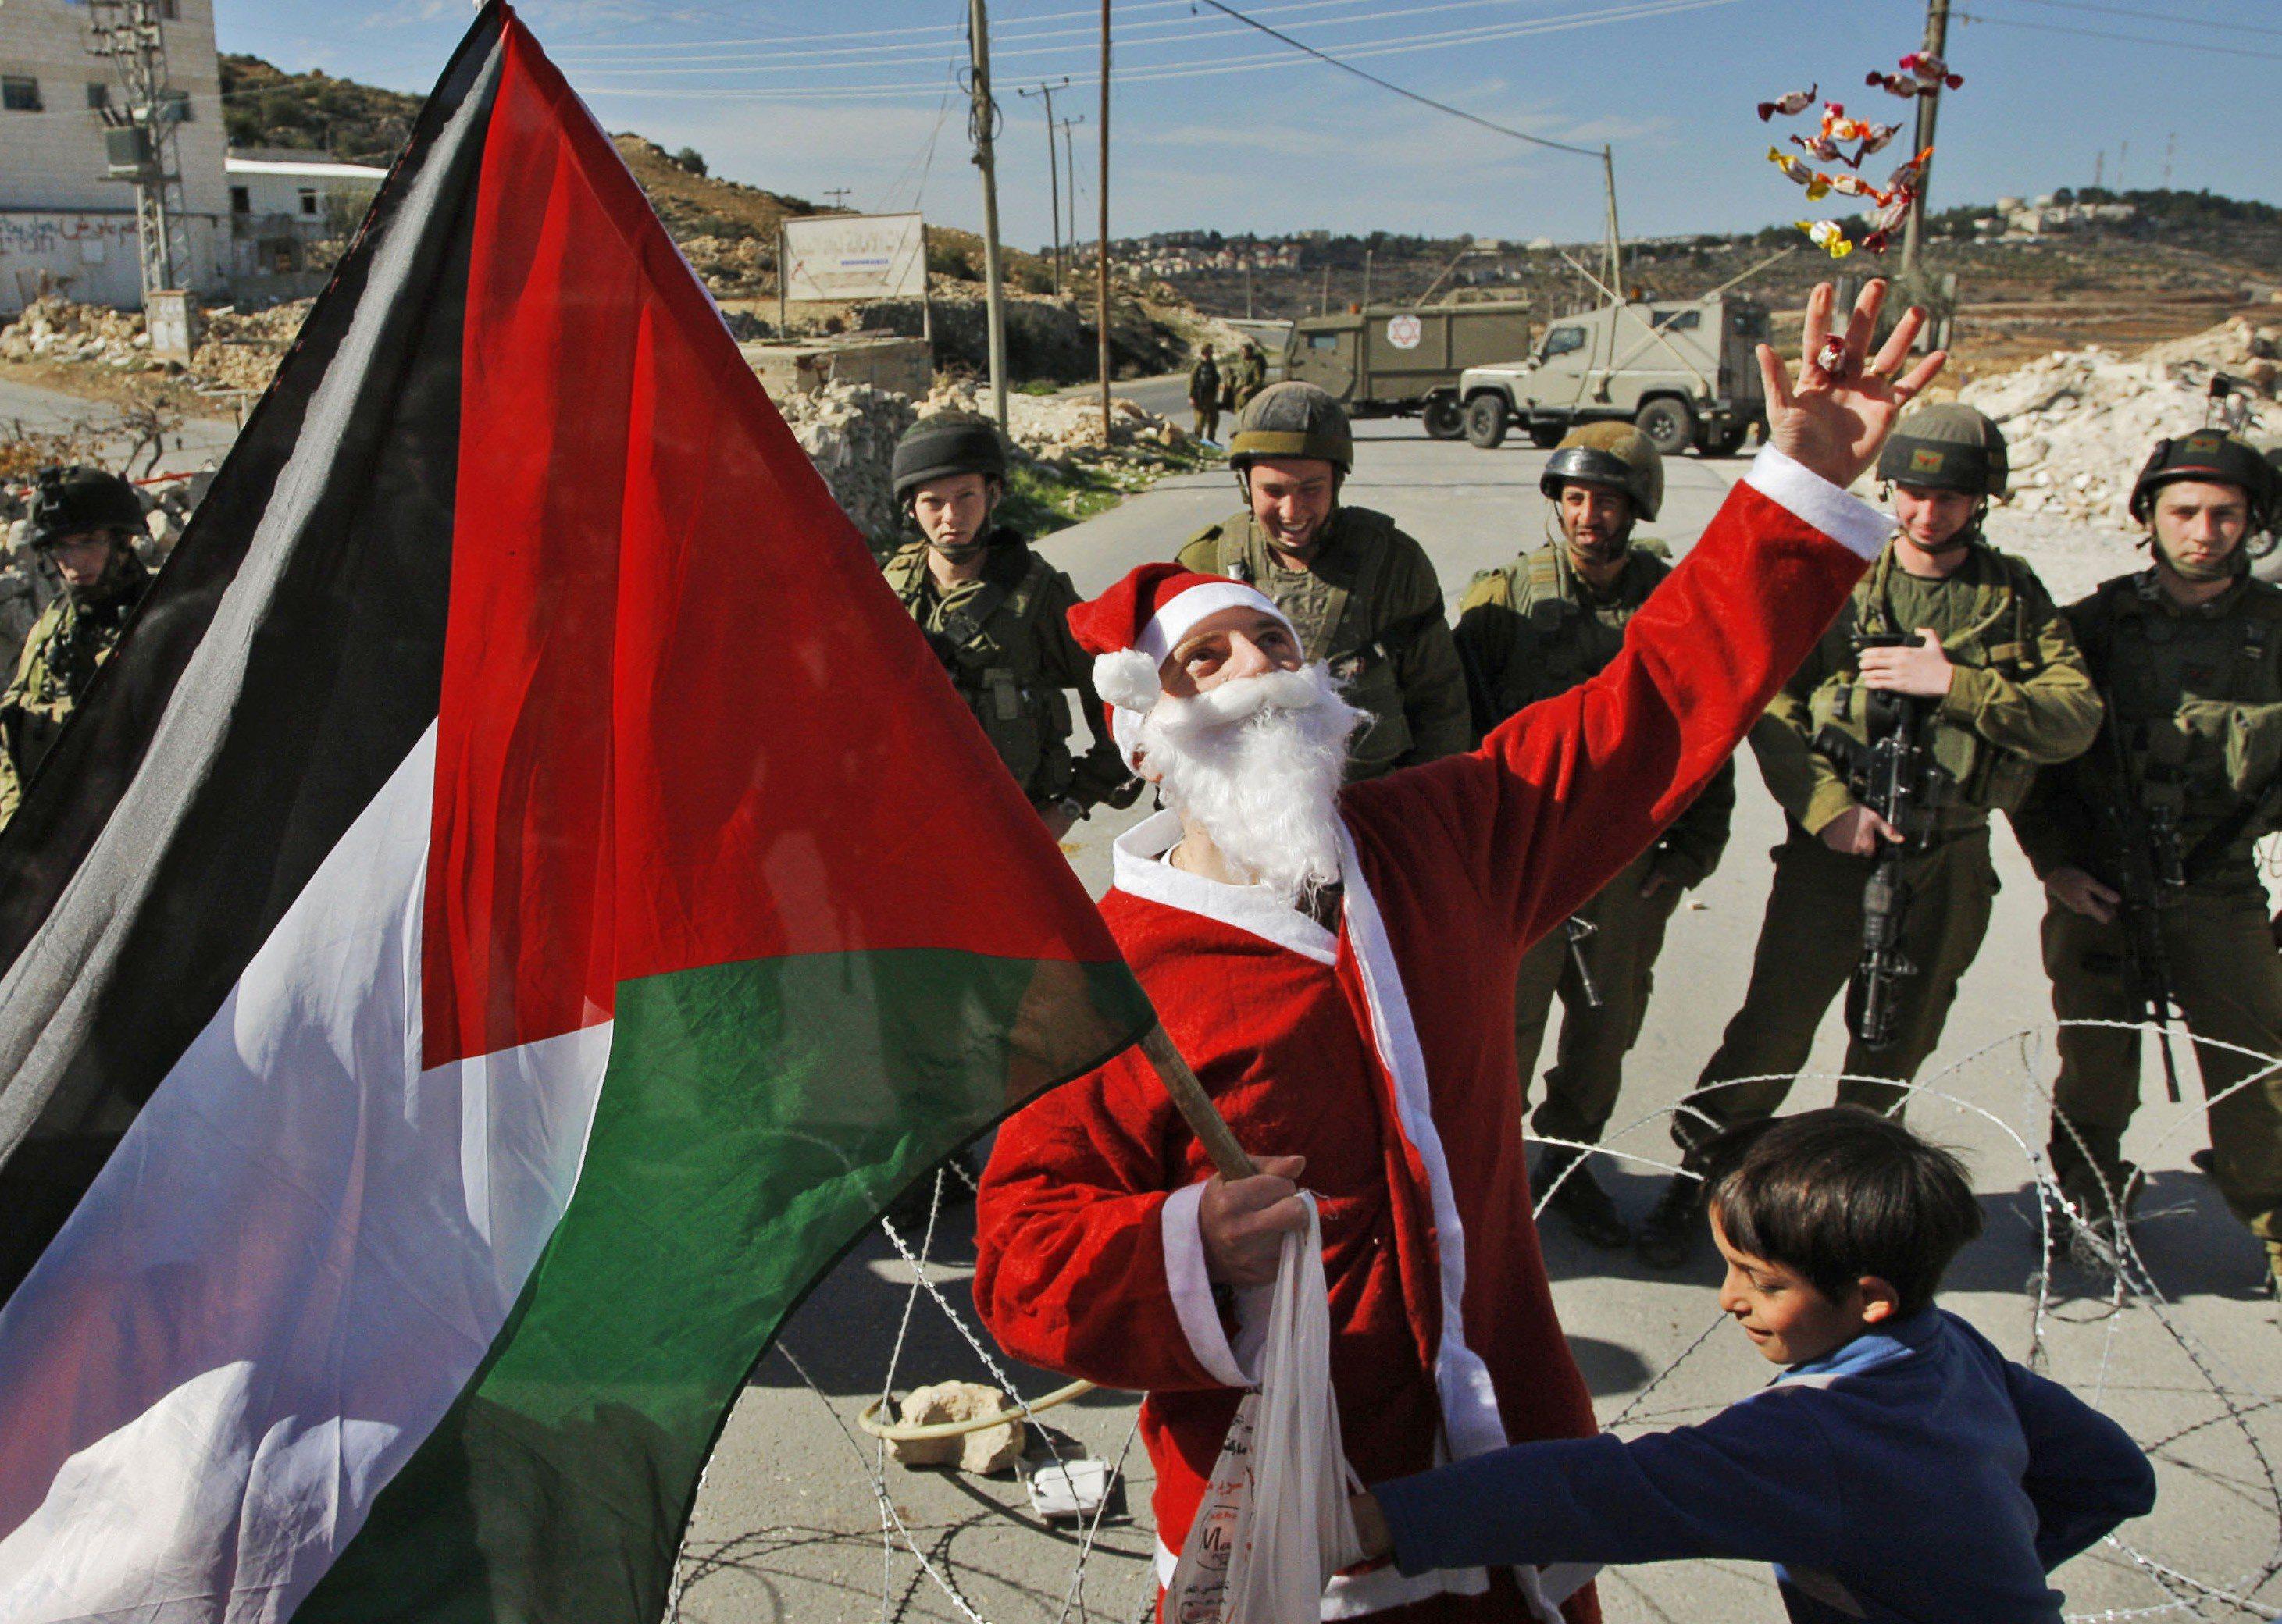 http://samiawad.files.wordpress.com/2008/12/mideast_israel_pale_6969081.jpg